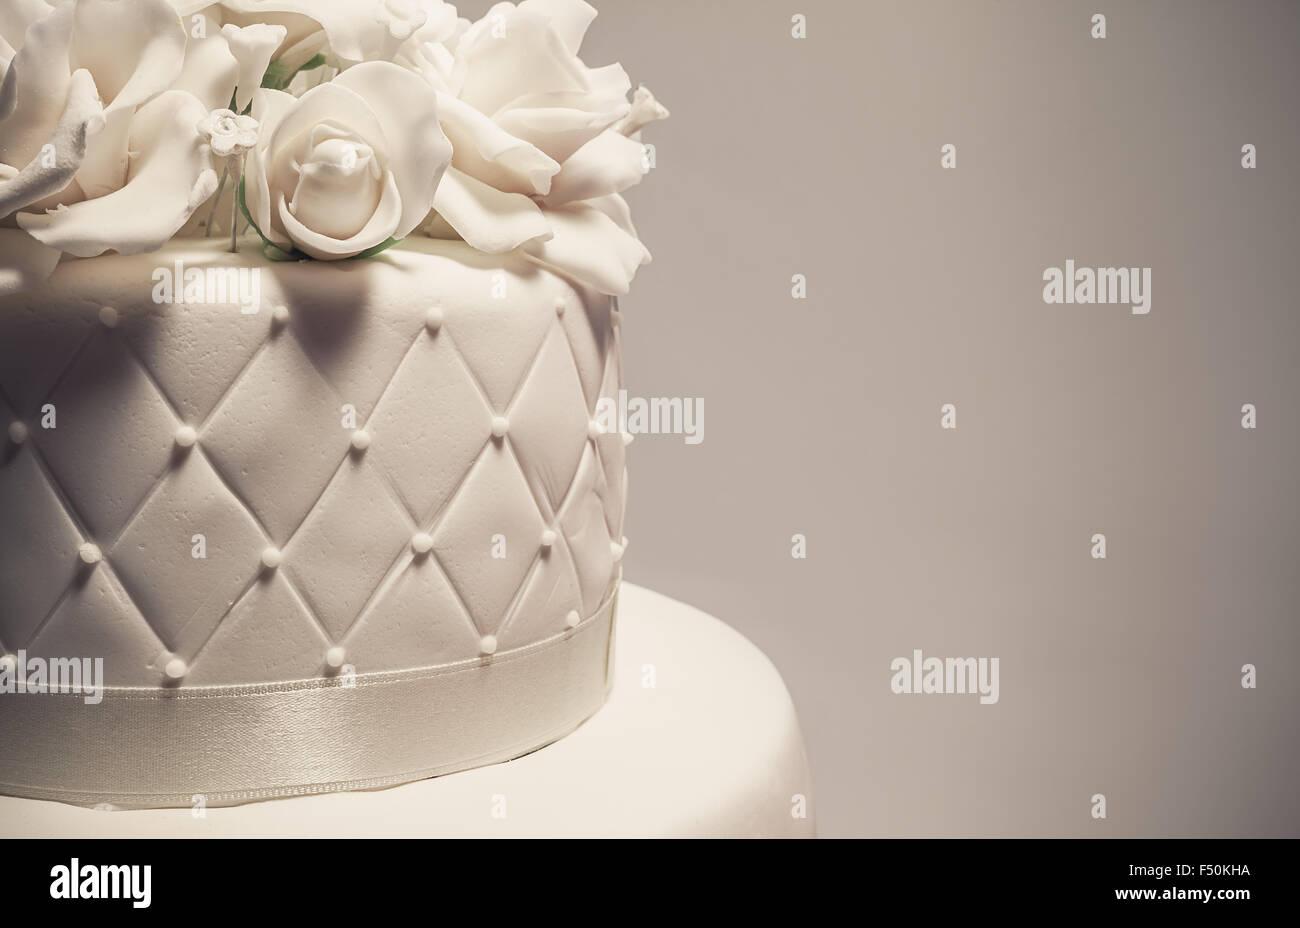 Detalles de un pastel de bodas, decoración con fondant blanco sobre fondo blanco. Imagen De Stock